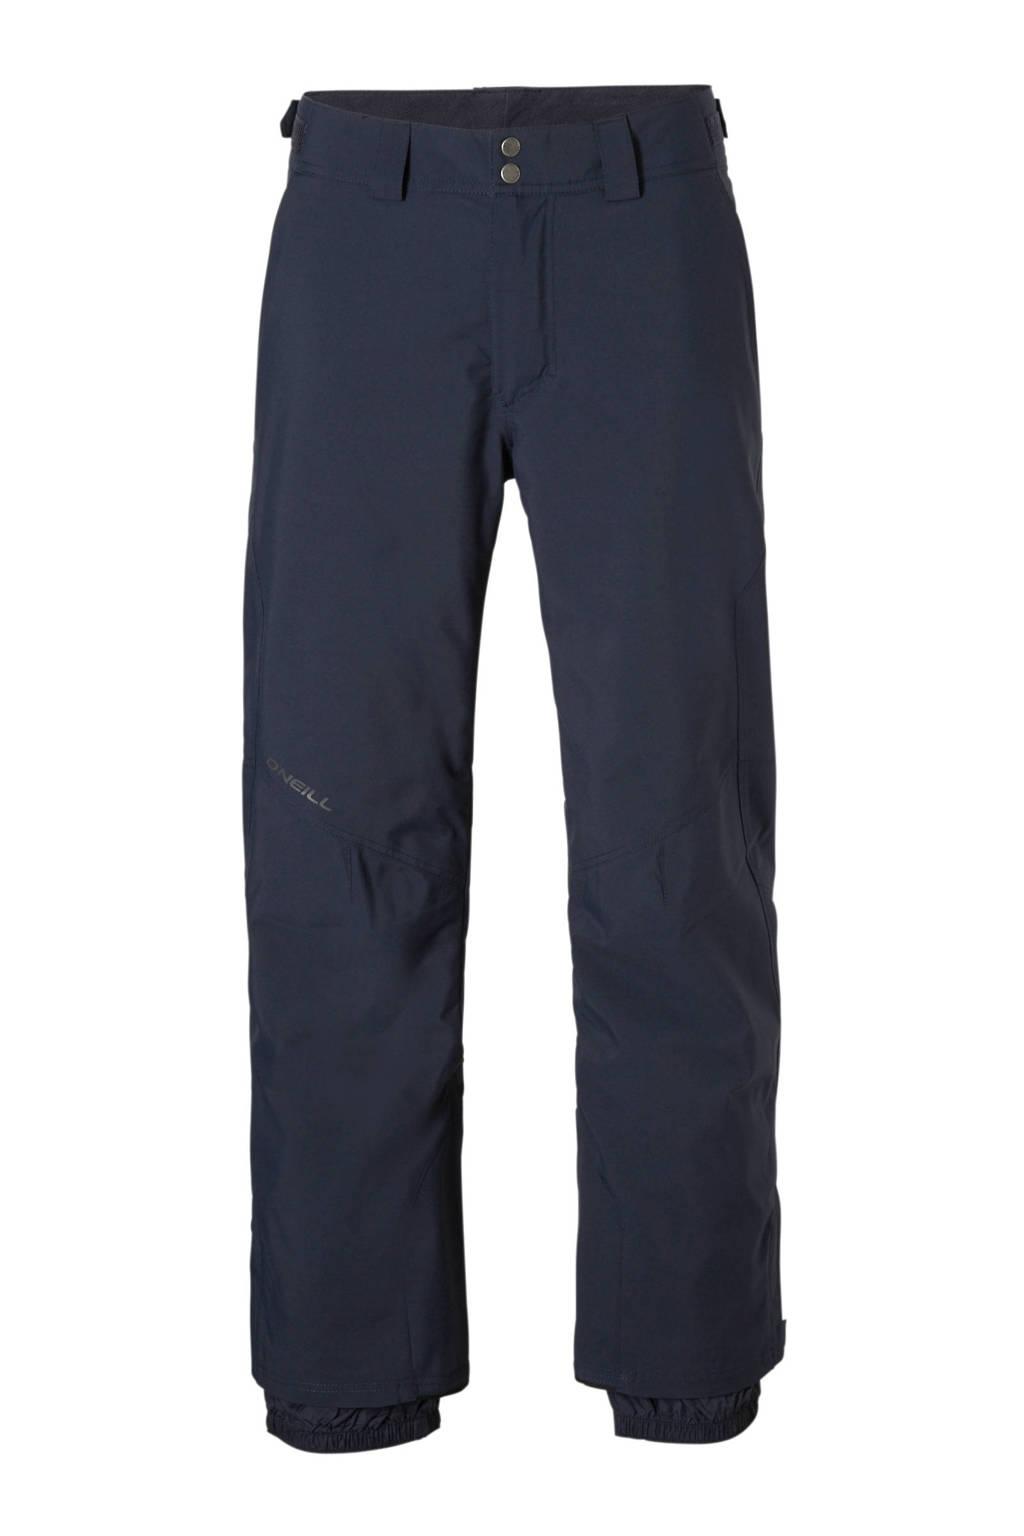 O'Neill skibroek donkerblauw, Donkerblauw